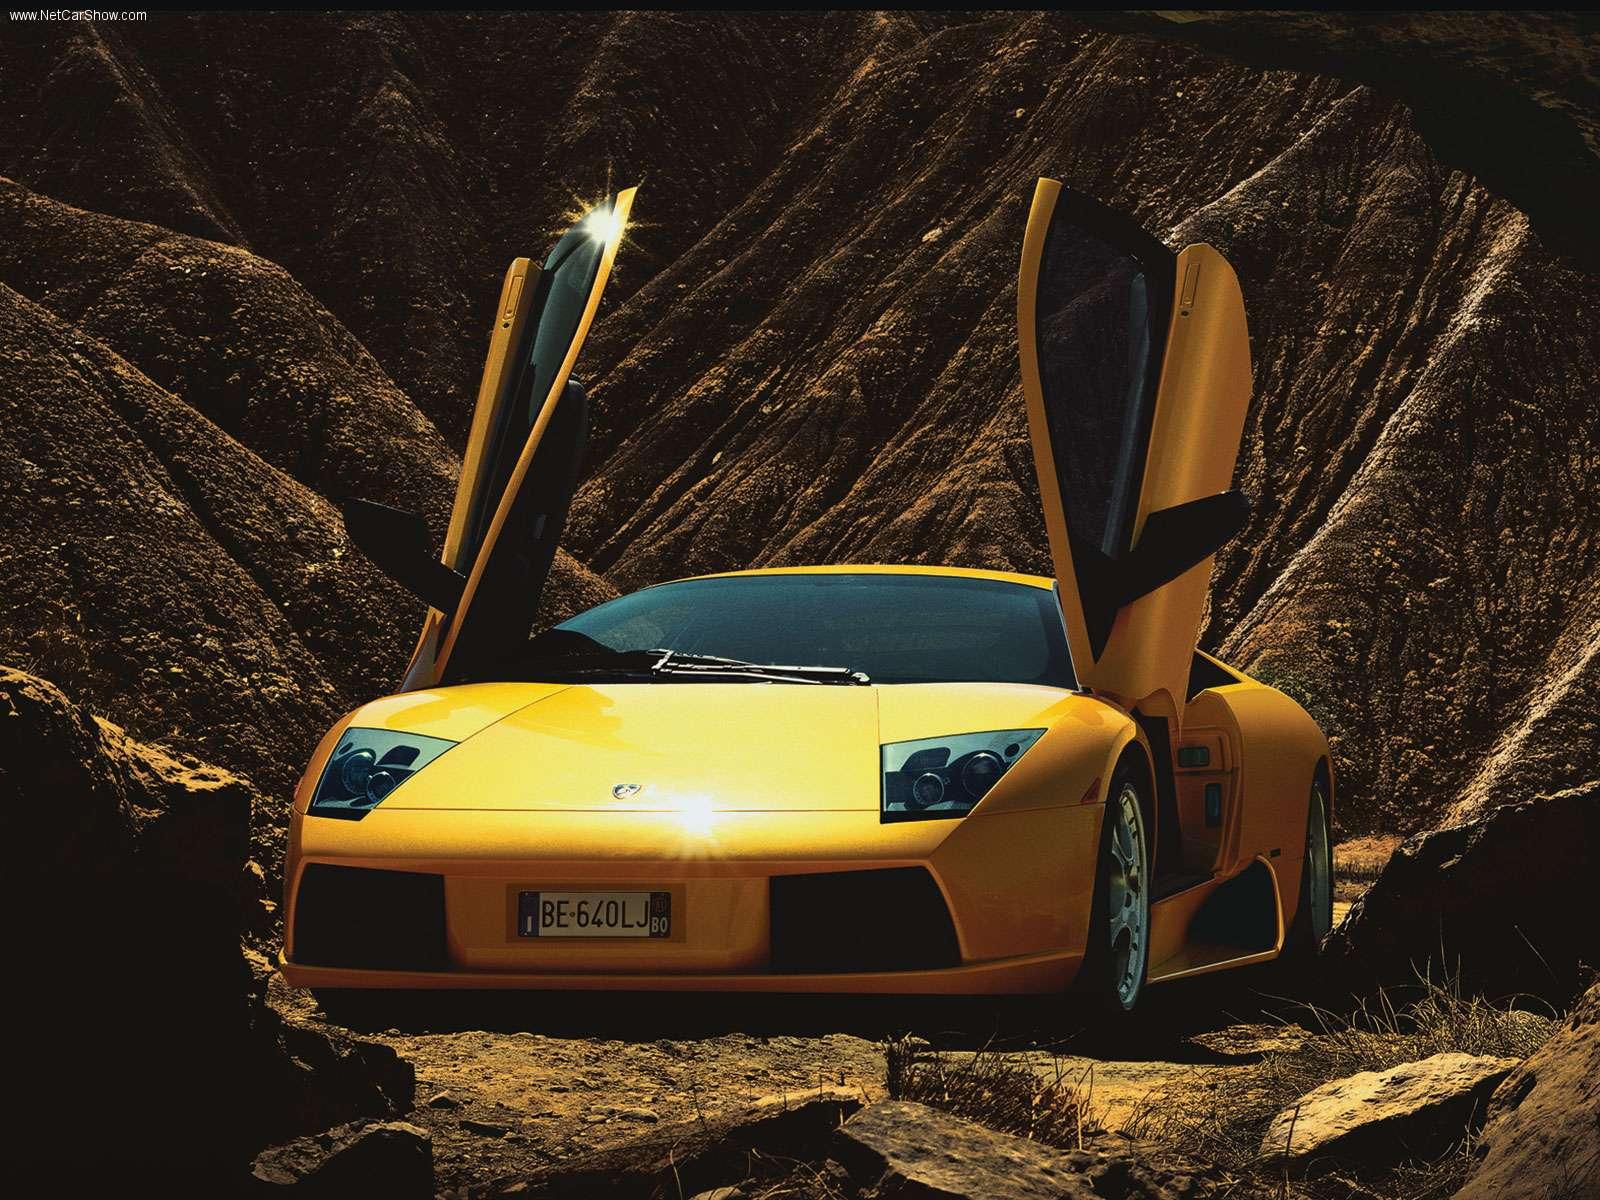 Fast Auto: Lamborghini Murcielago Cool Wallpapers Hd